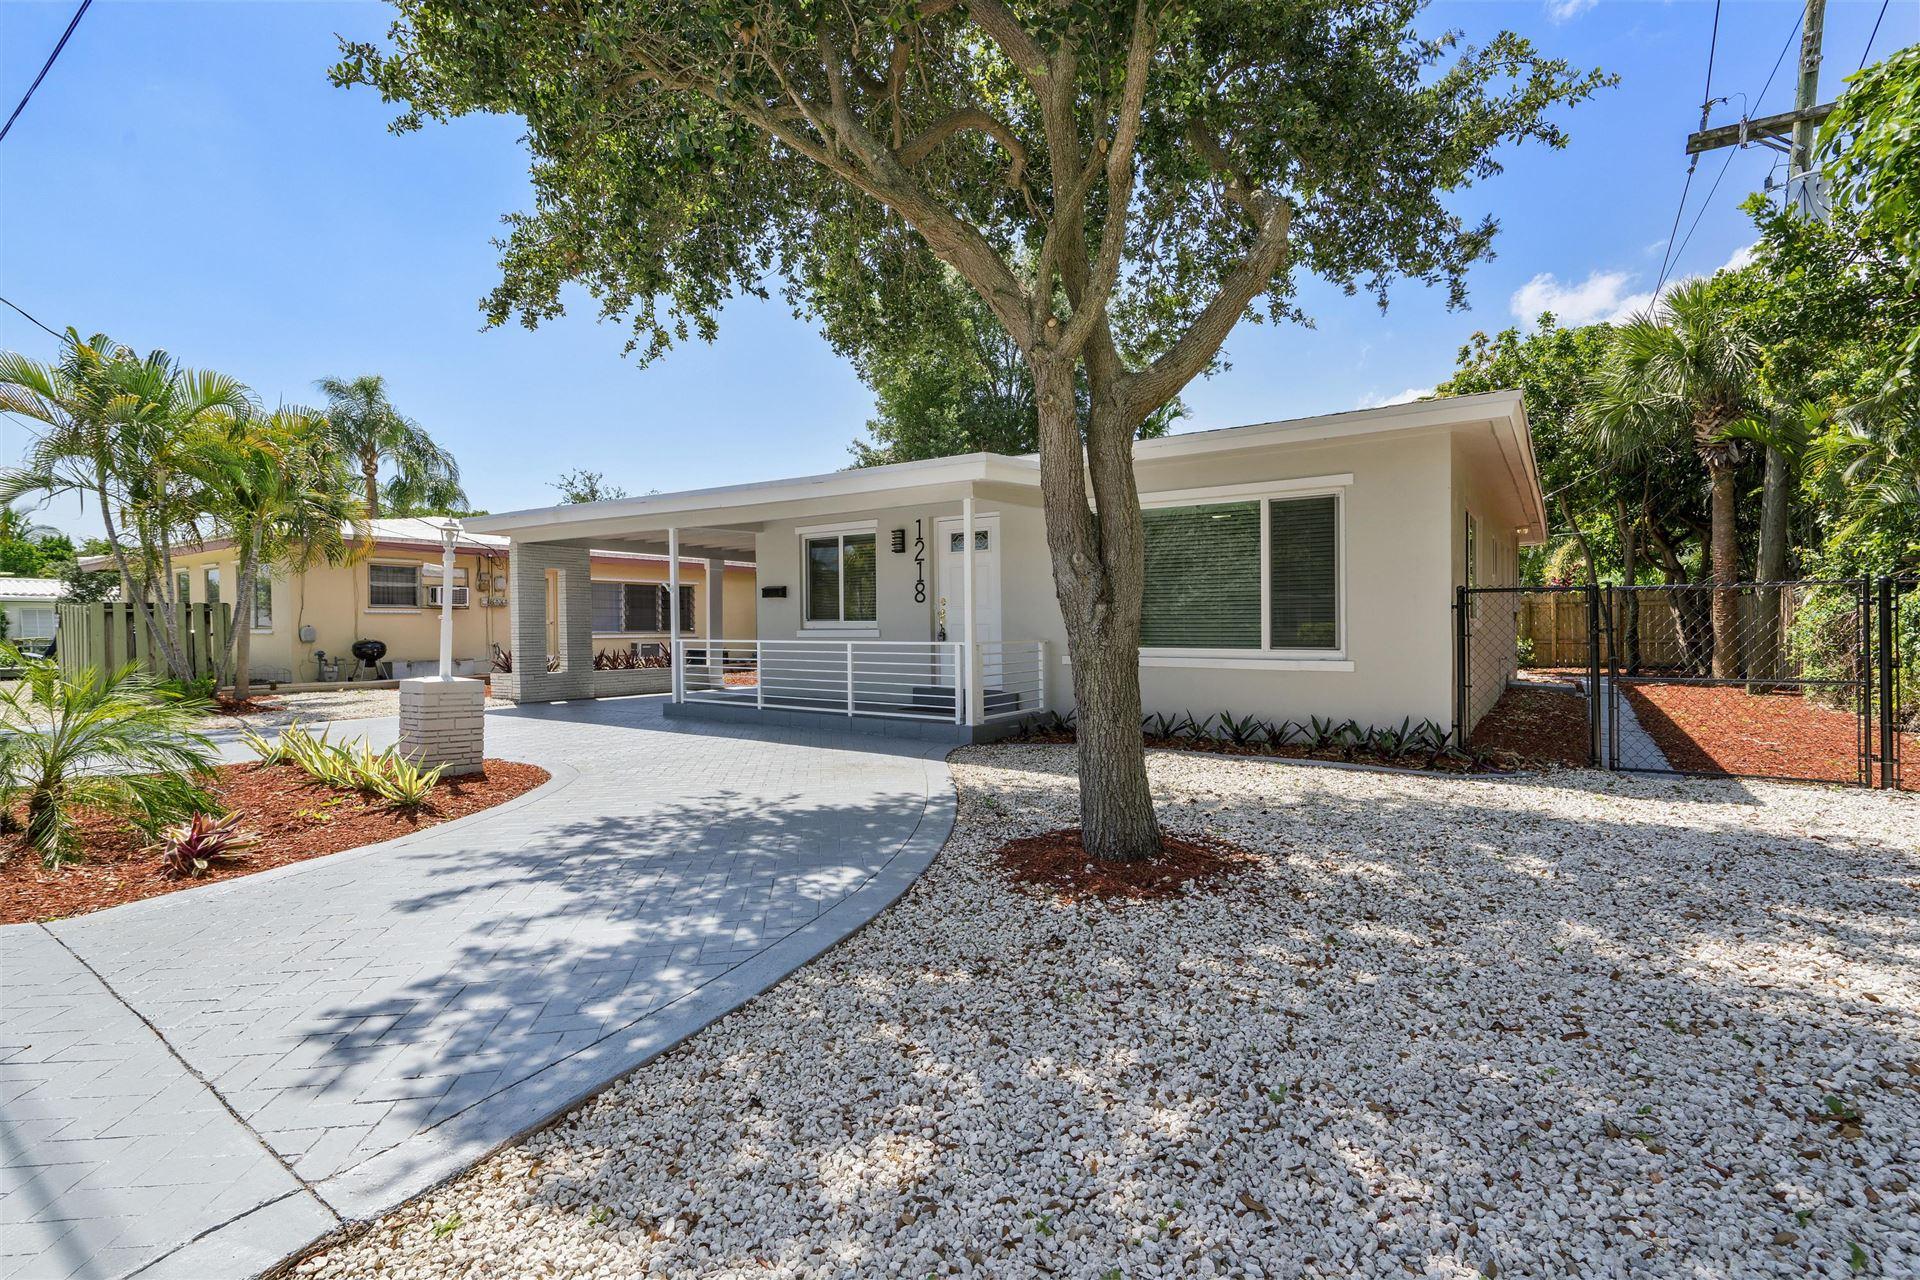 1218 NE 12th Street, Fort Lauderdale, FL 33304 - #: RX-10705027